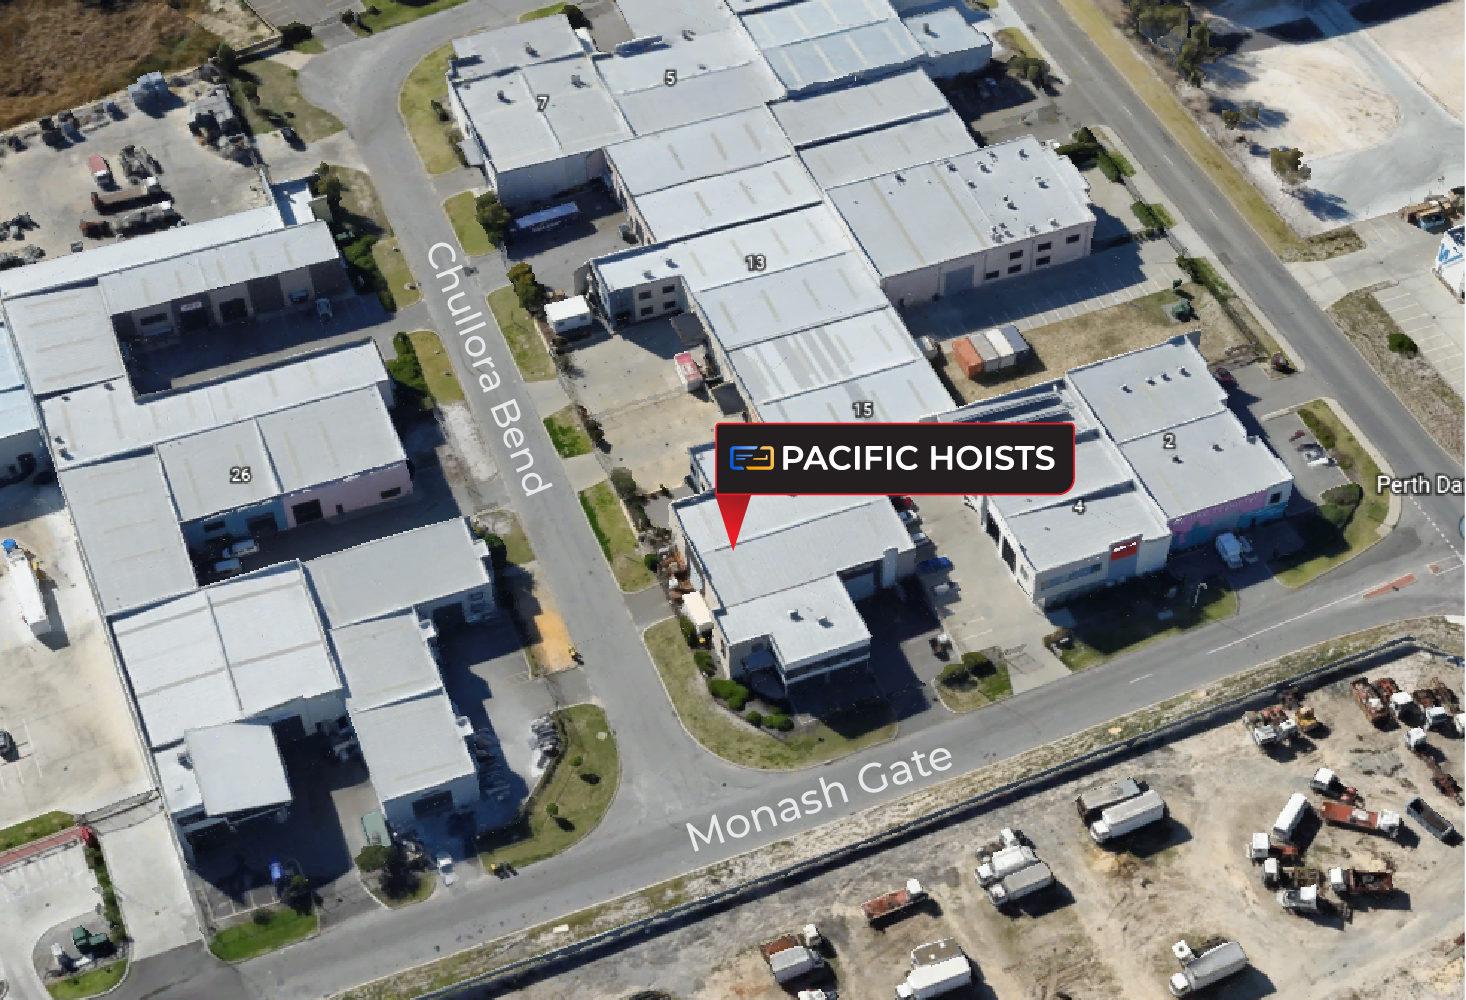 Pacific Hoists WA Relocation